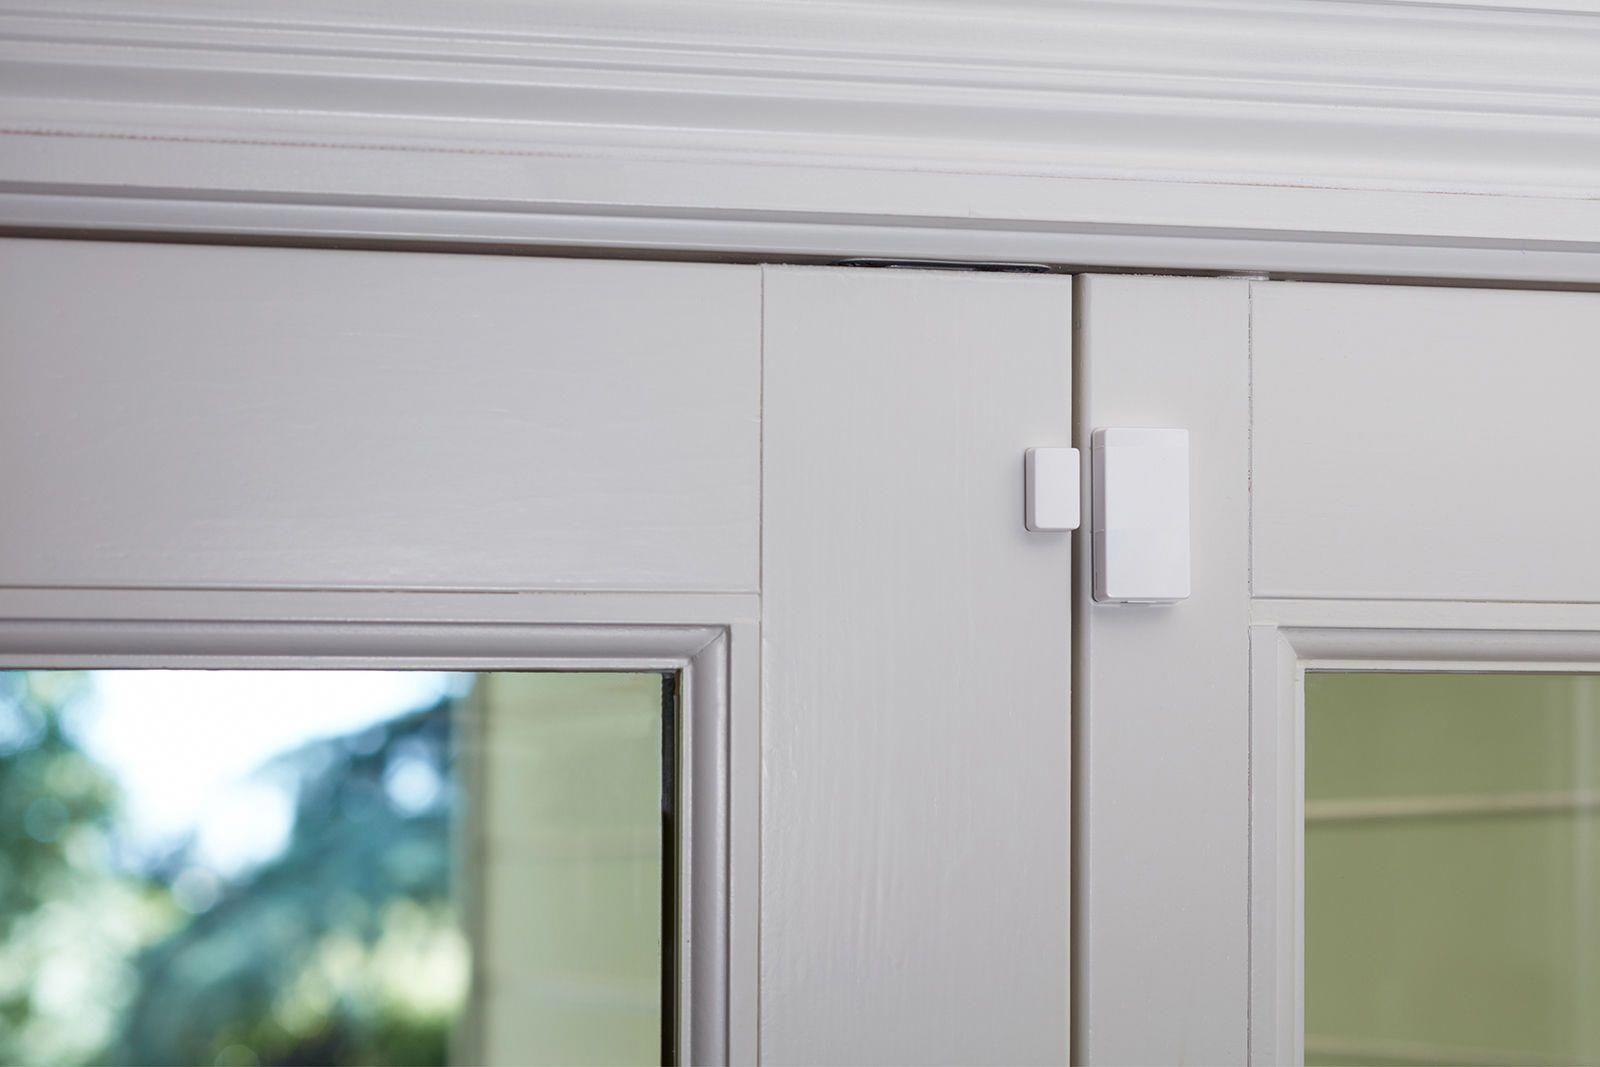 Abode Mini Door Window Sensor Wireless Home Adhesive Security Alarm Sensor 23 0 End Date Wireless Home Security Systems Home Security Wireless Home Security